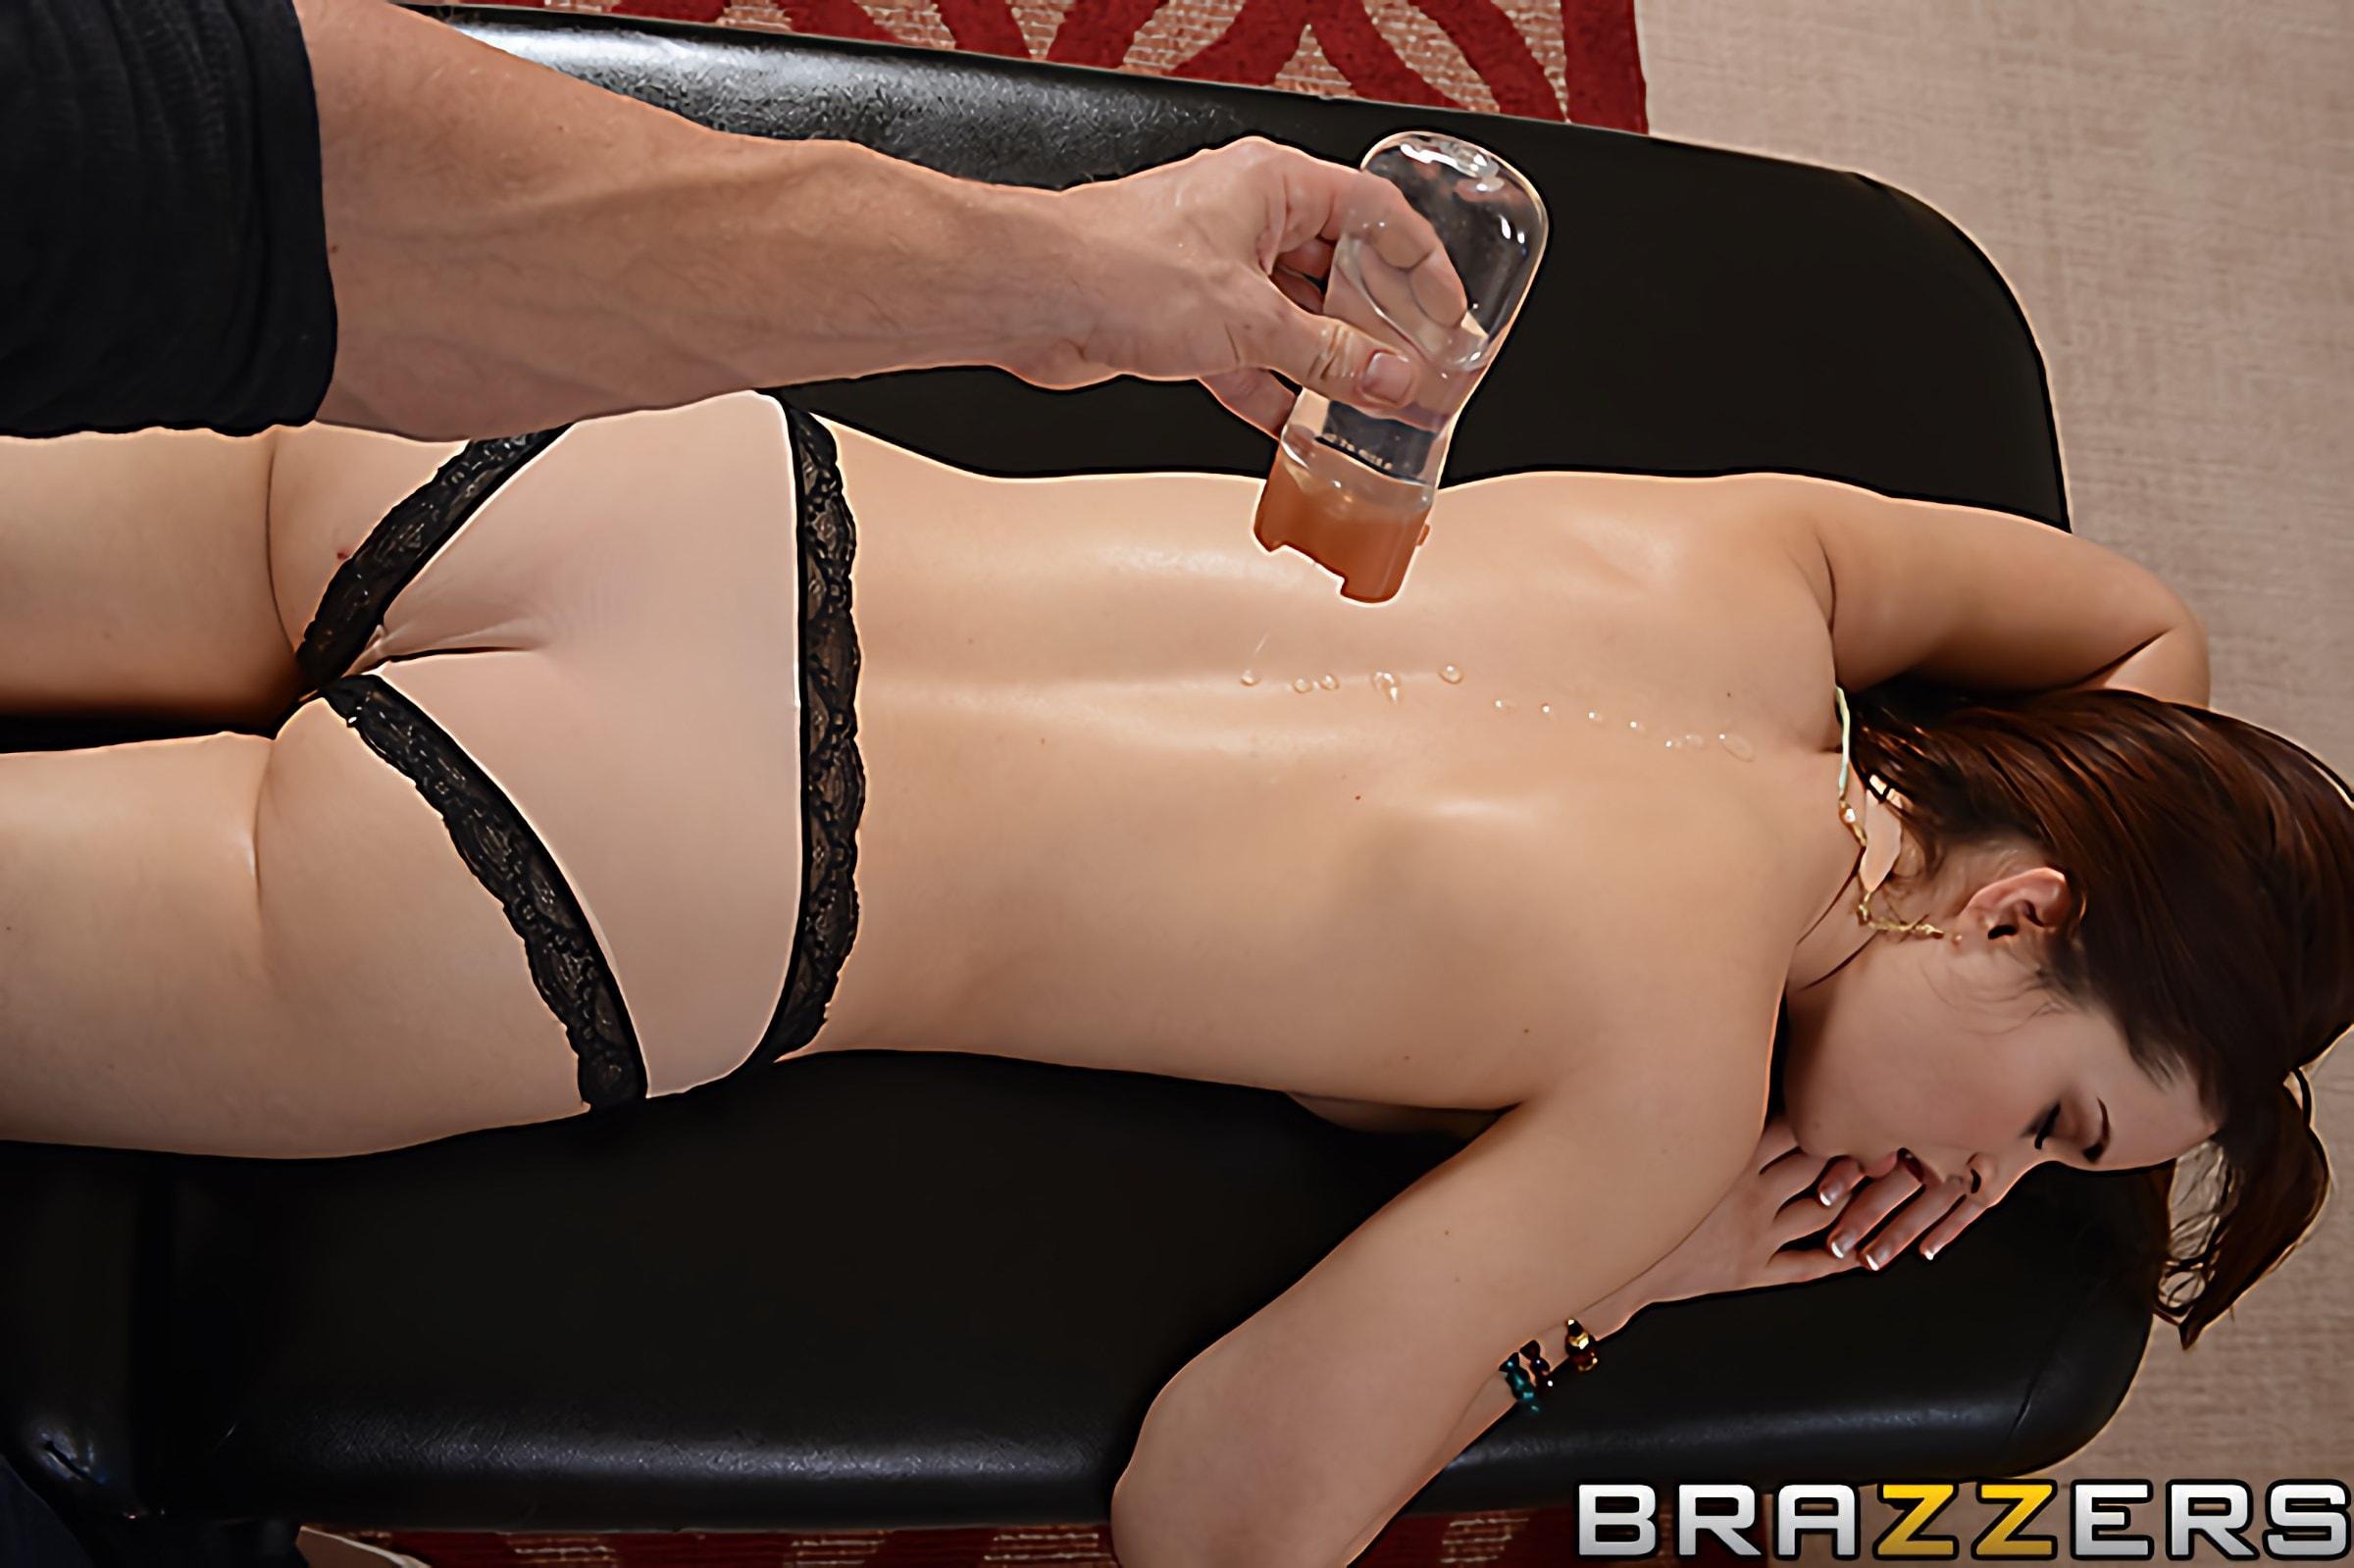 Brazzers 'Splash Time' starring Jenna Ross (Photo 10)